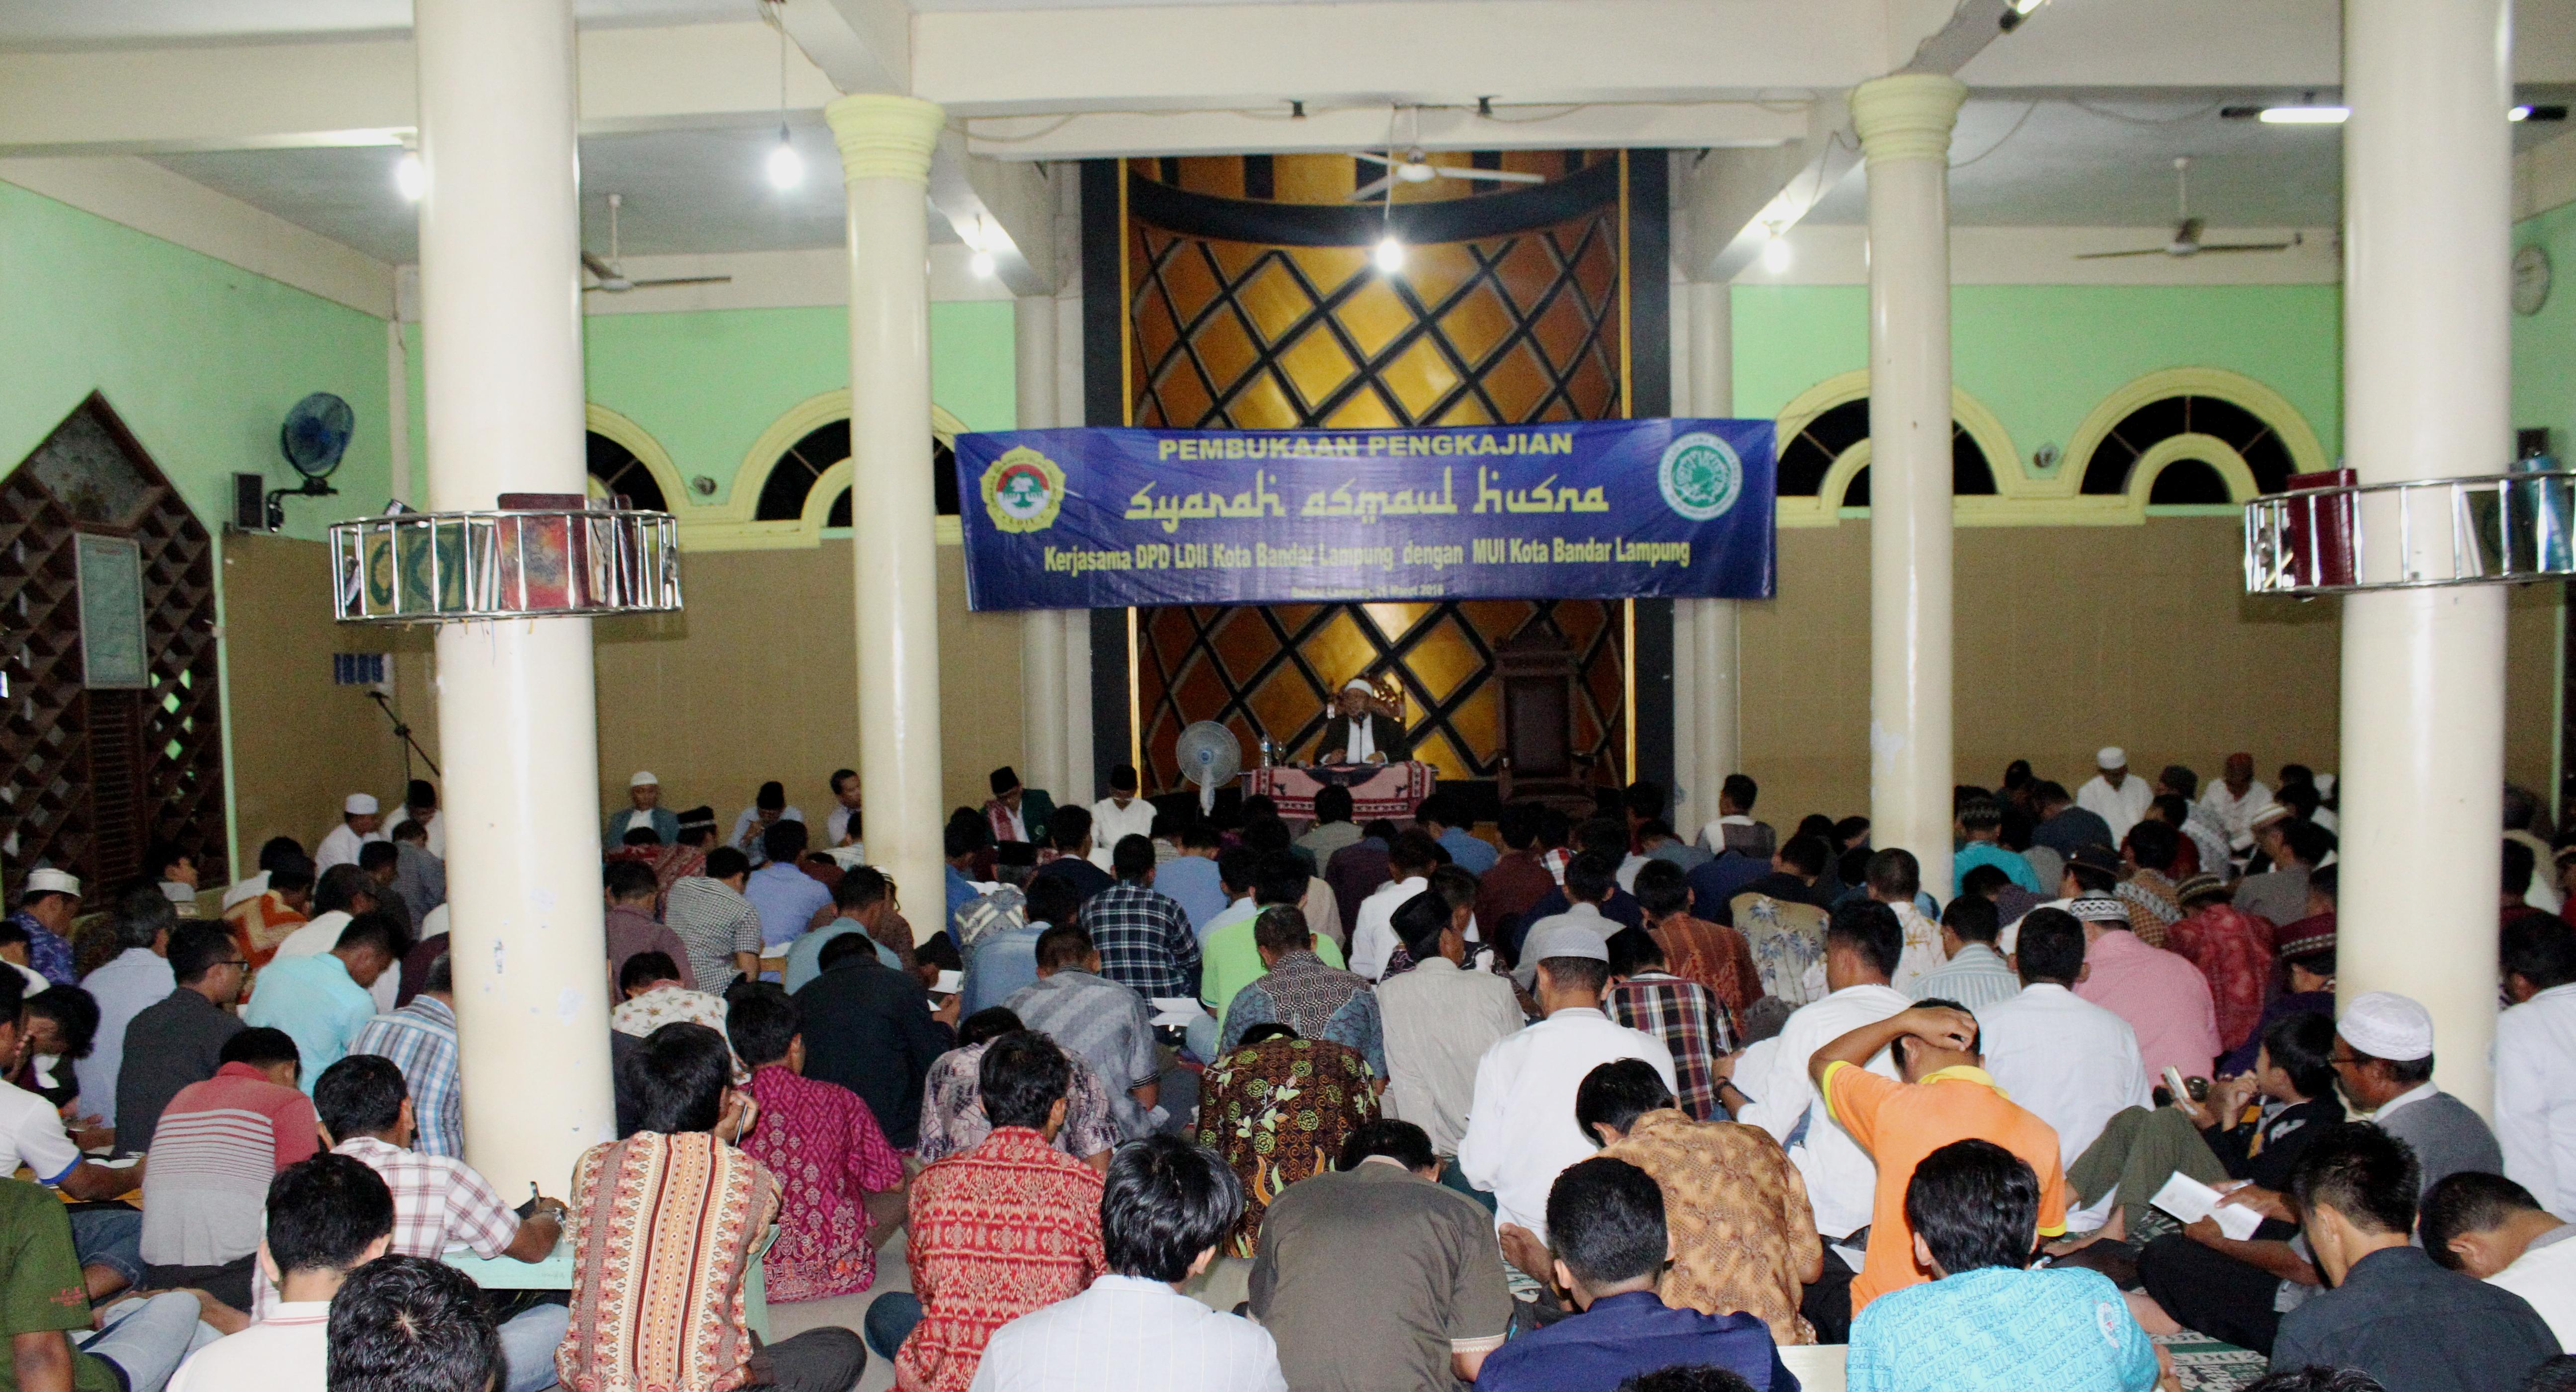 Peserta Syarah Asmaul Husna LDII Kota Bandar Lampung